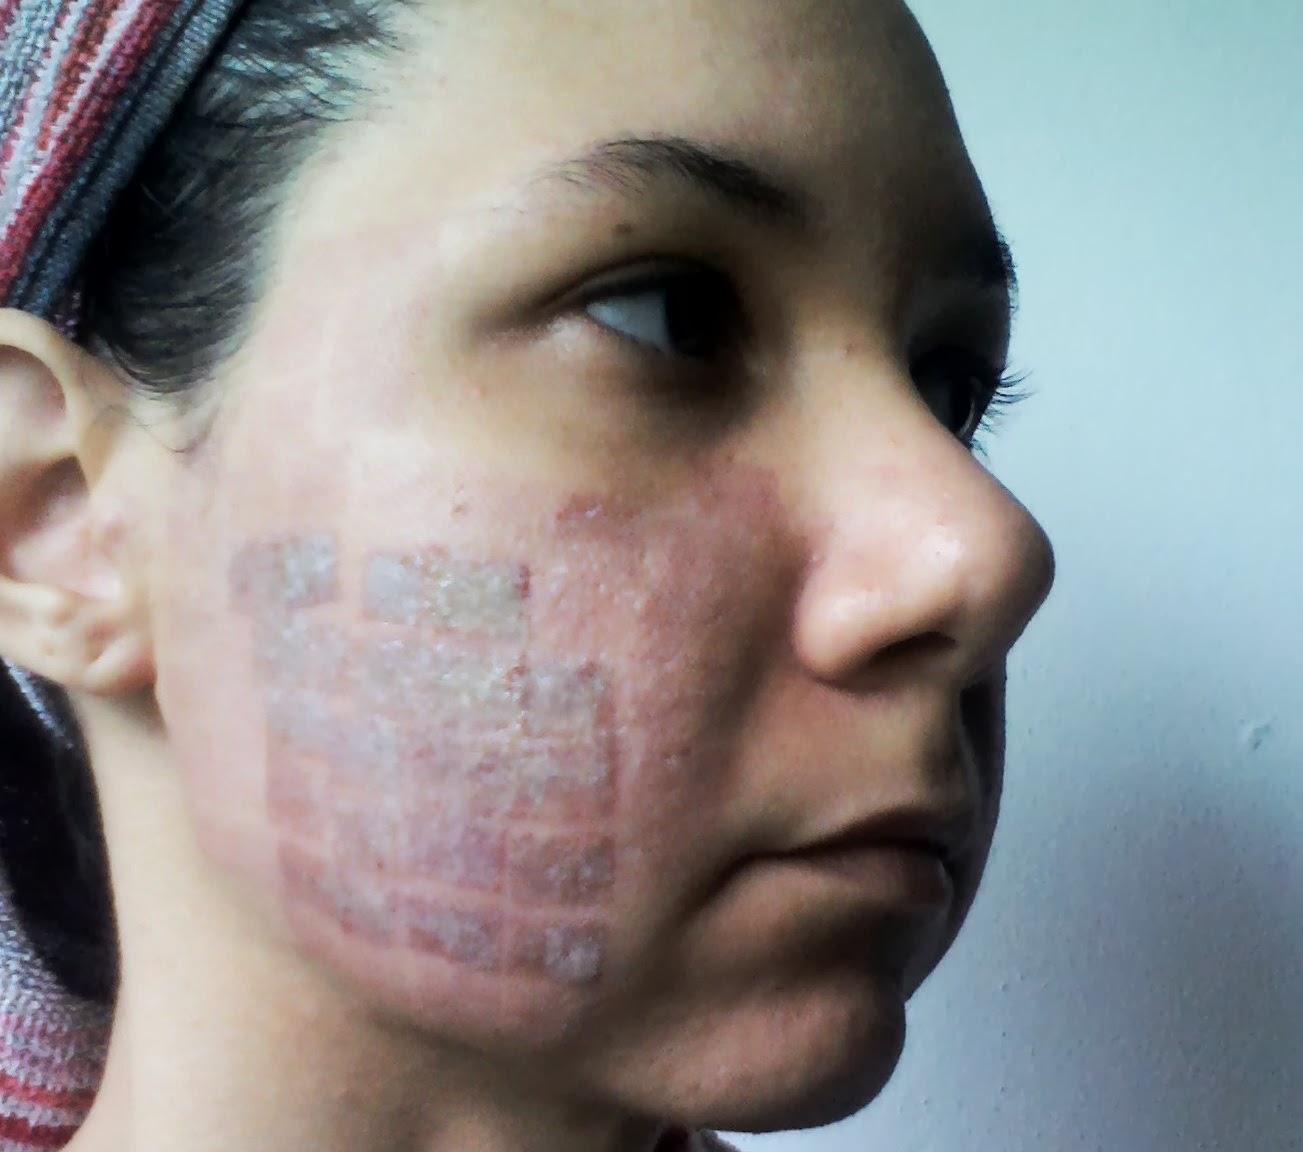 Schwarzer Schimmel Tapete : Oncologia, Acne e Rinoplastia: Dermato – Laser CO2 Fracionado – 2?